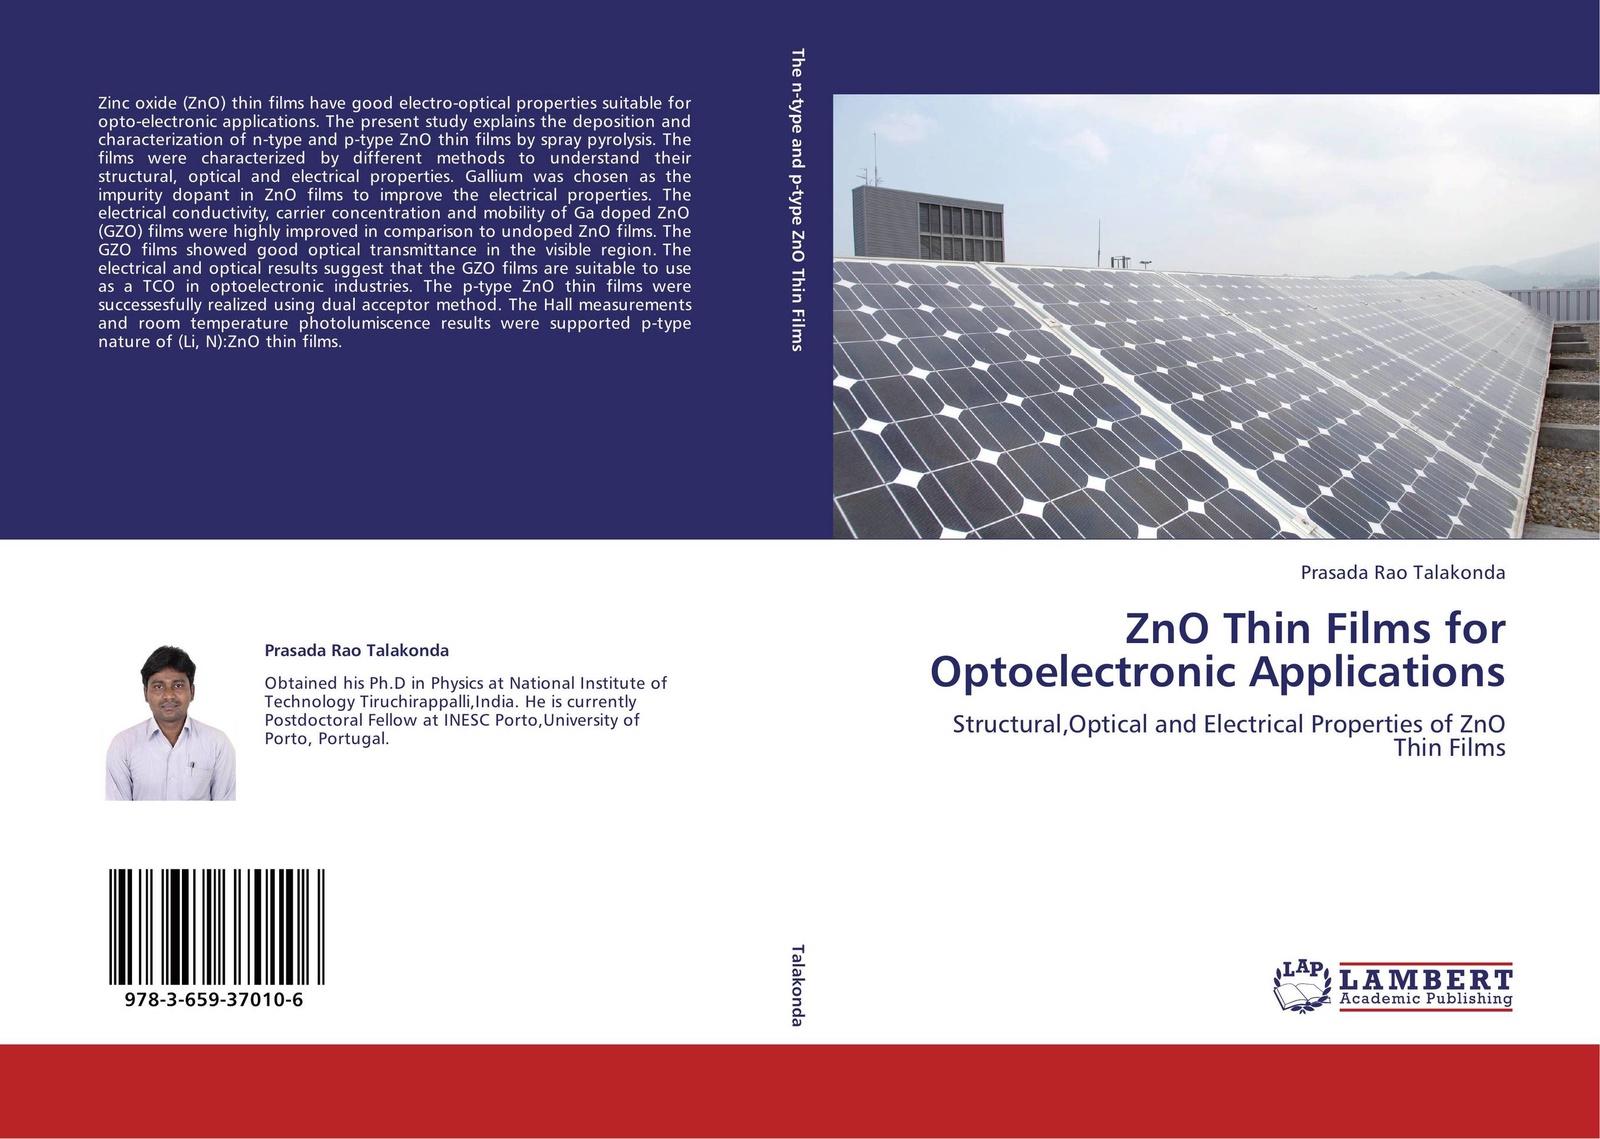 Prasada Rao Talakonda ZnO Thin Films for Optoelectronic Applications kazi hussain a study of copper indium di sulfide semiconductor thin films